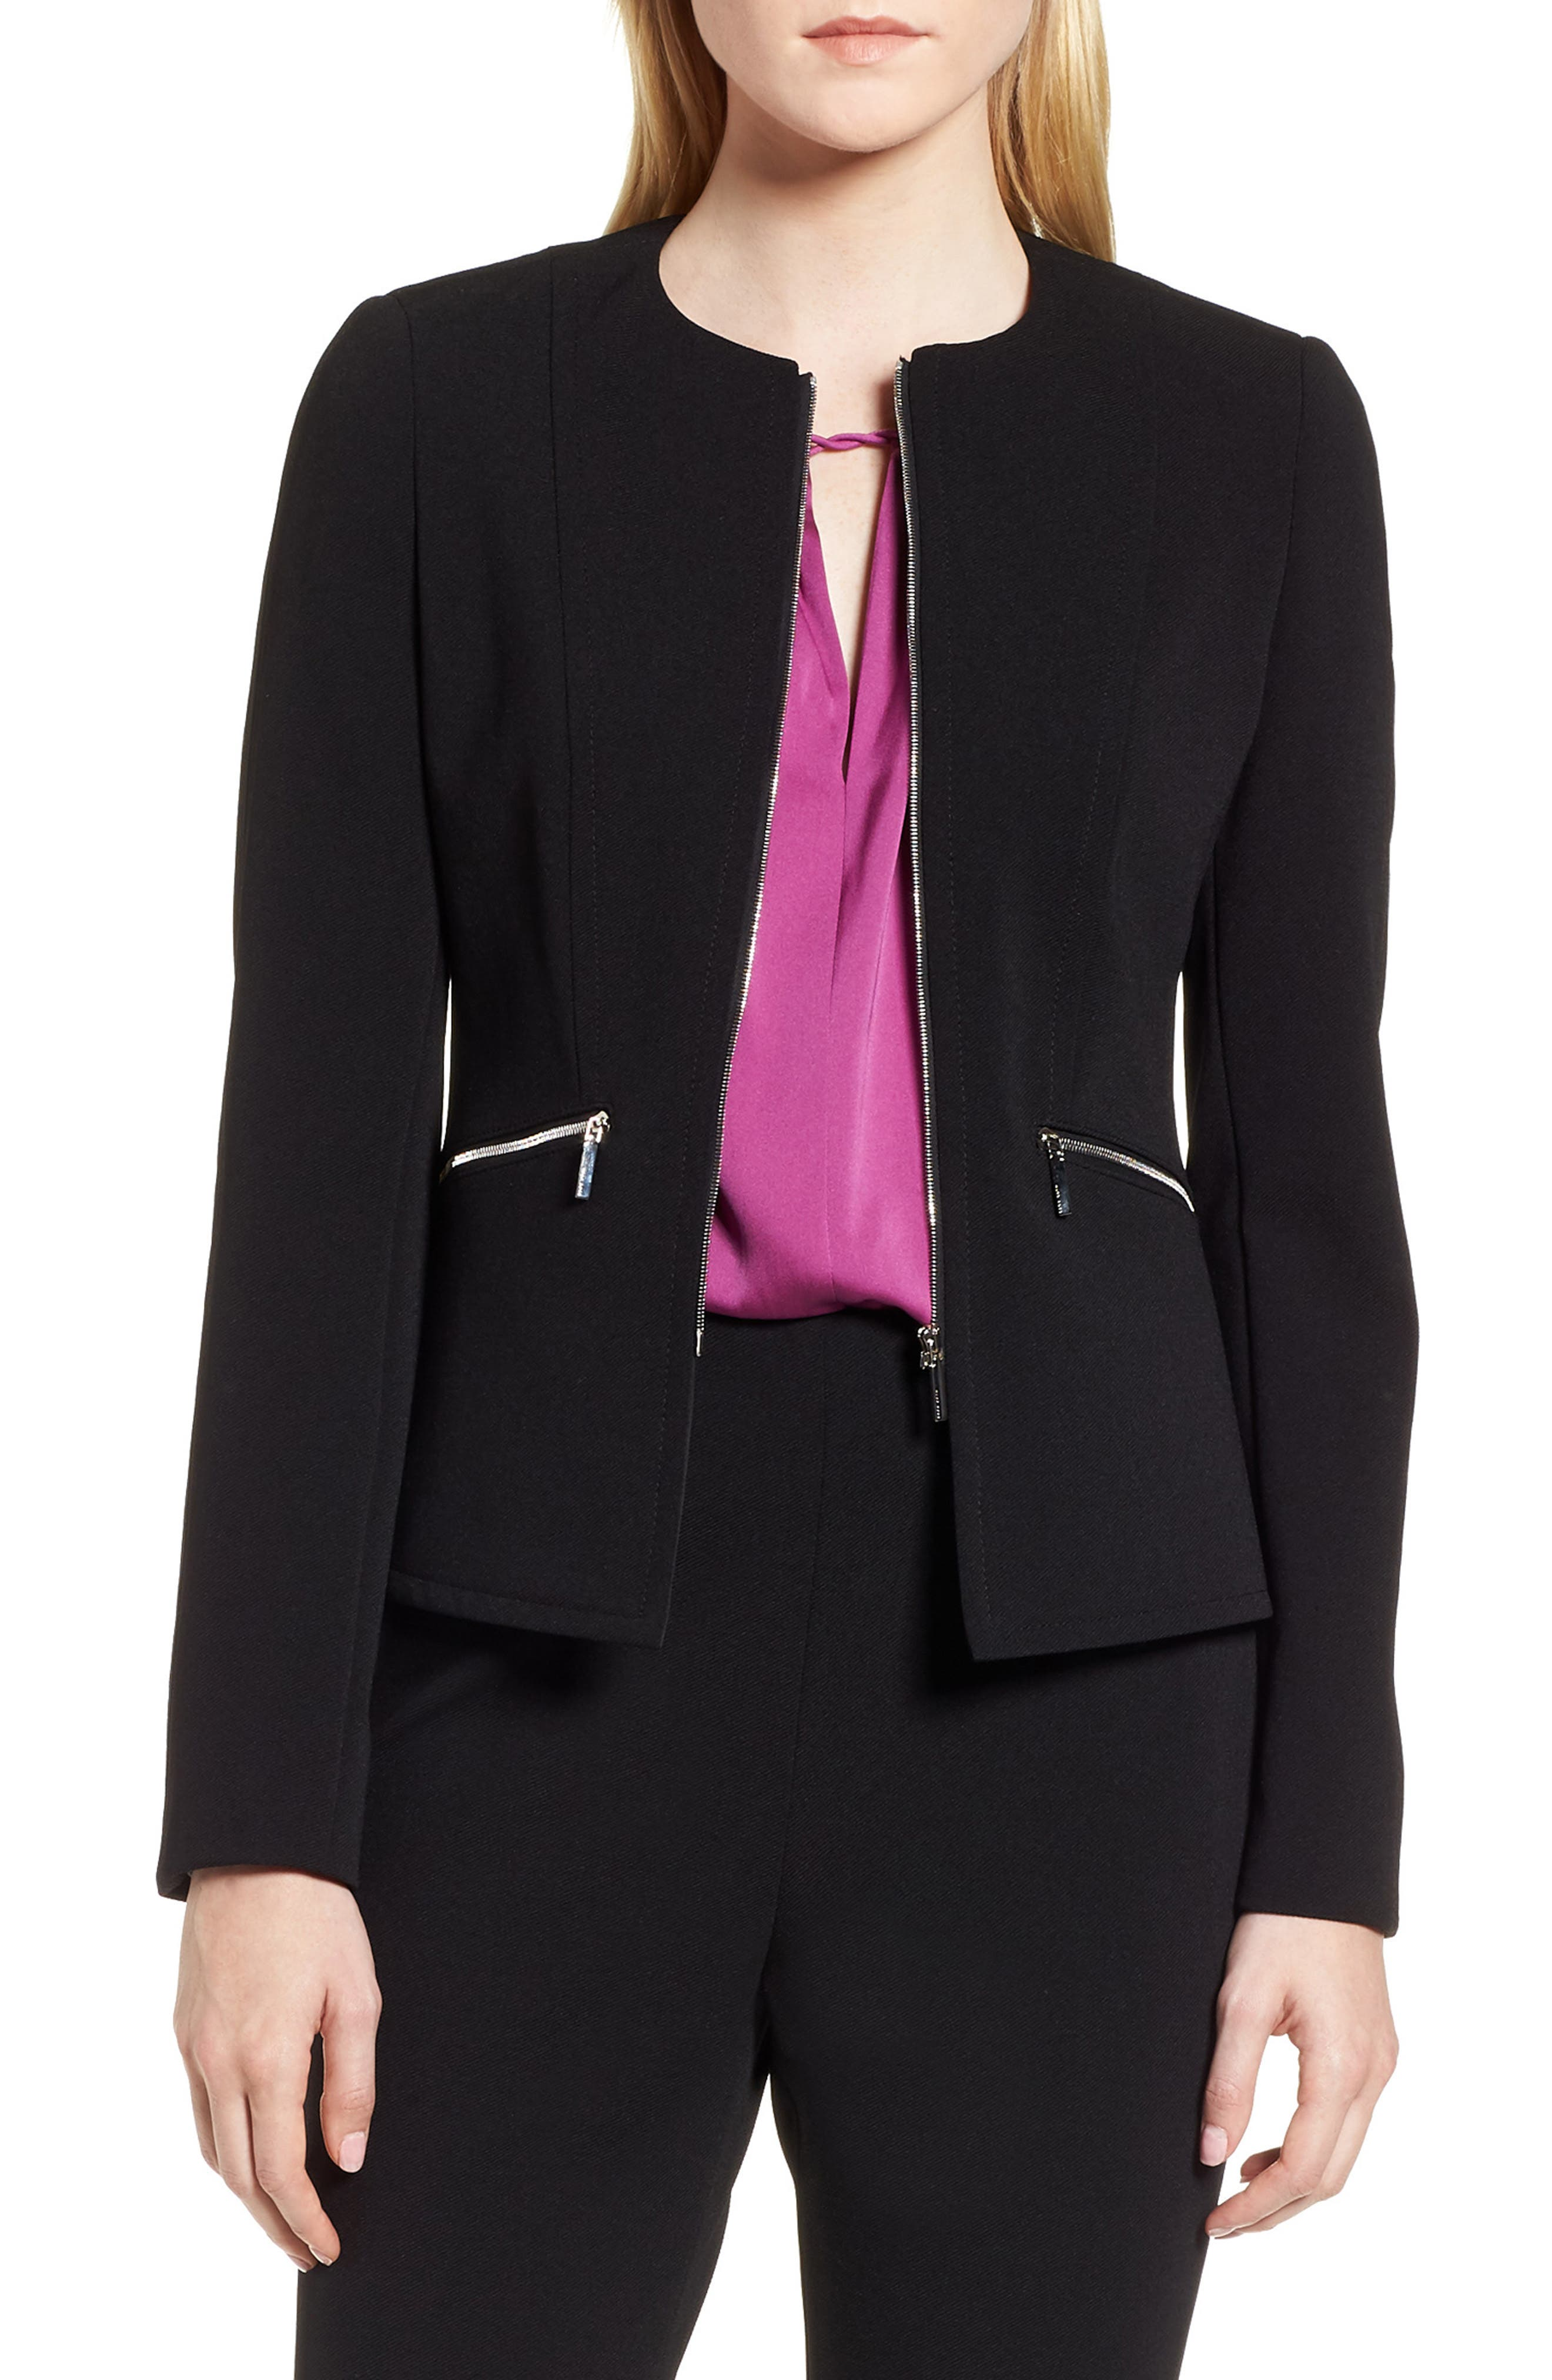 Jazulara Twill Jersey Suit Jacket,                         Main,                         color, 001